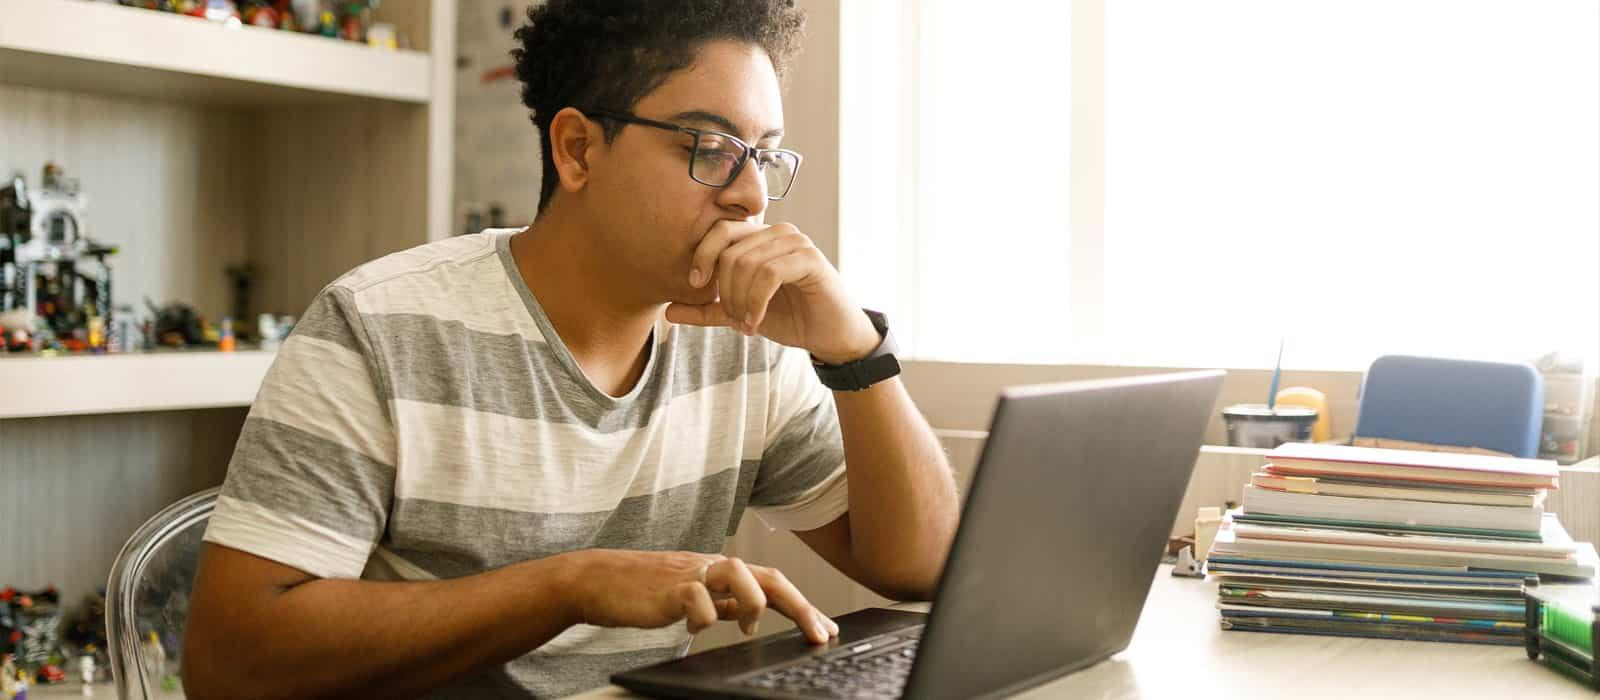 Male in striped shirt scrolling on black laptop